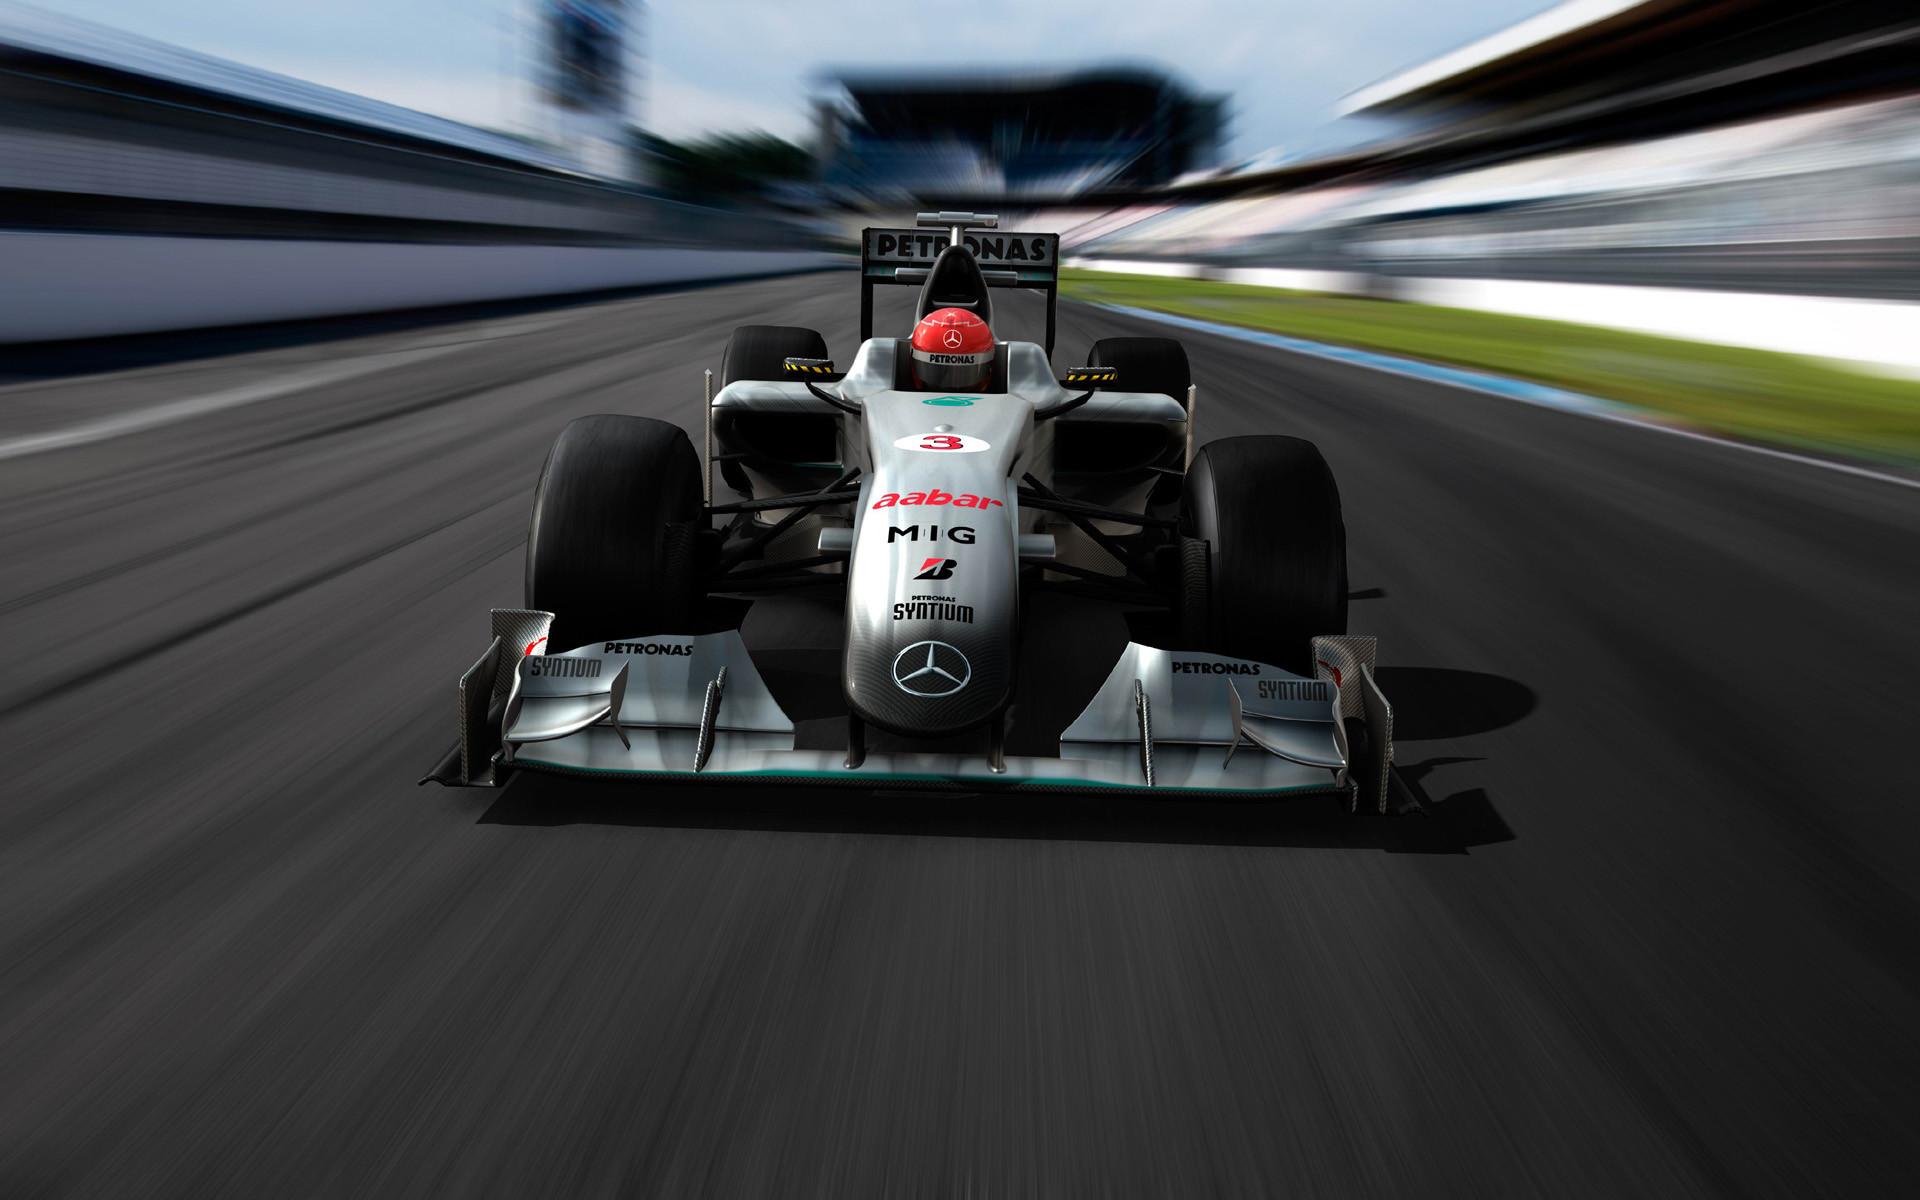 F1 Mercedes Wallpaper Full HD #u9Y